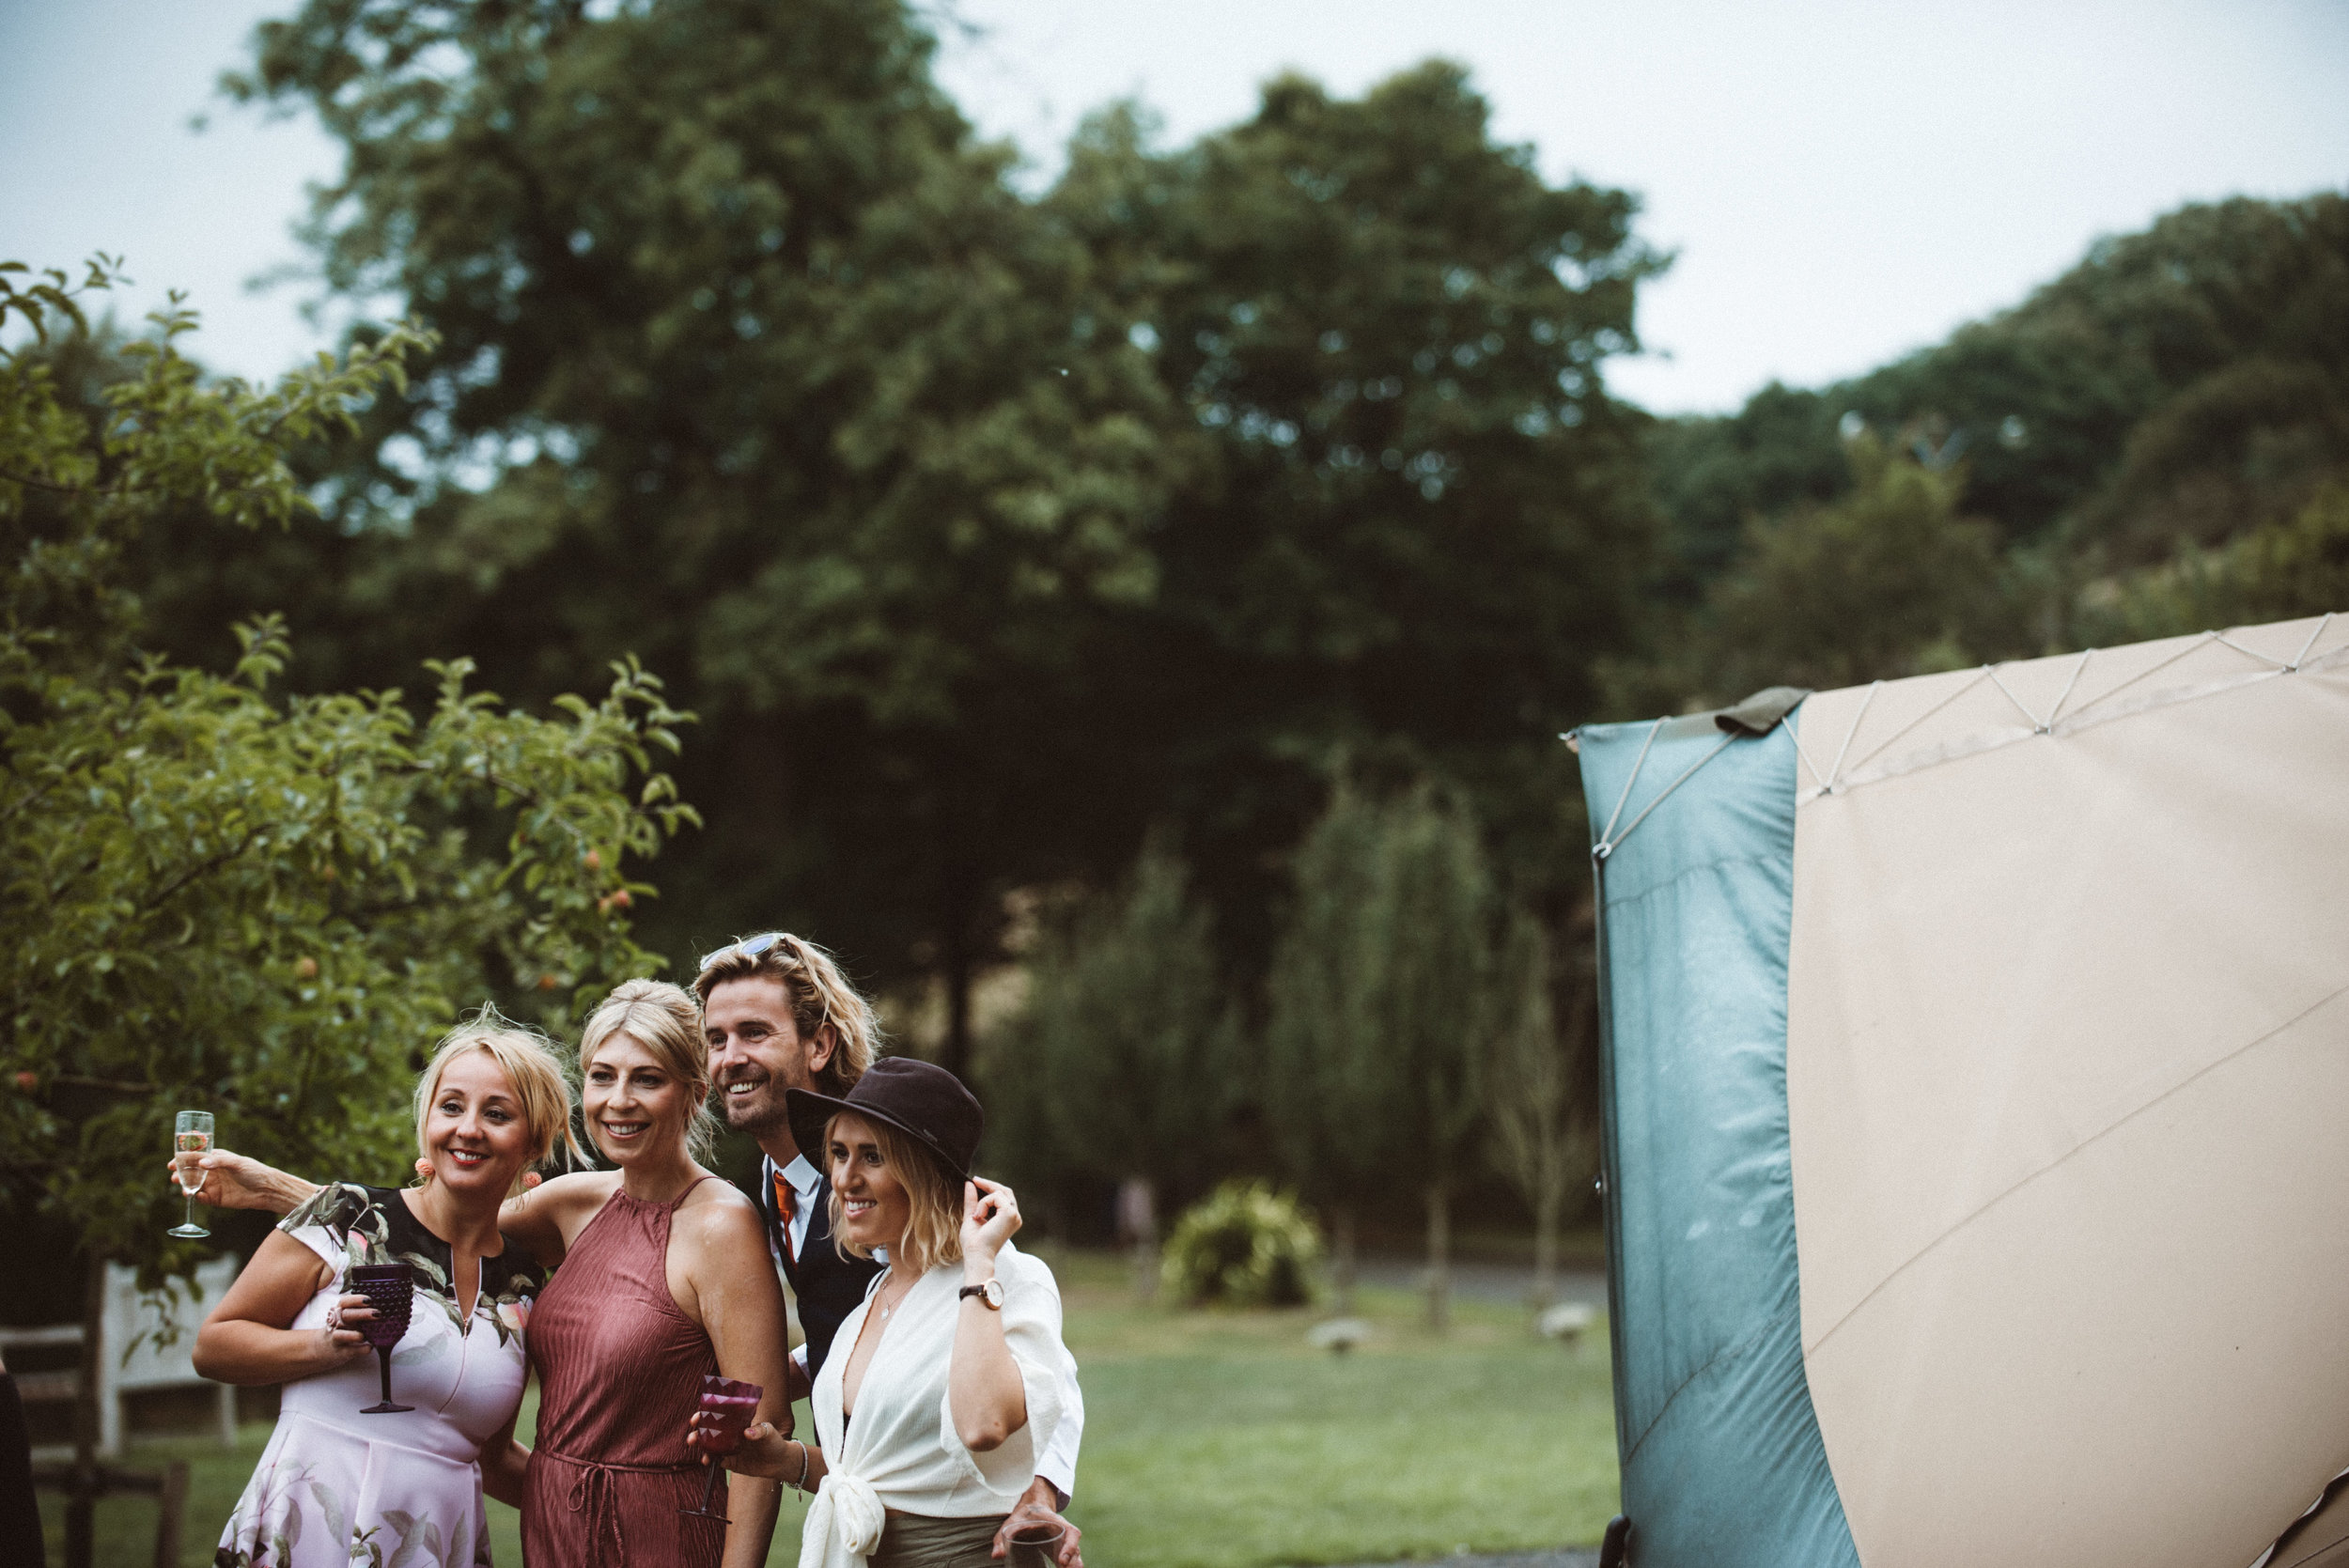 pengenna-manor-wedding-photographer-61.jpg